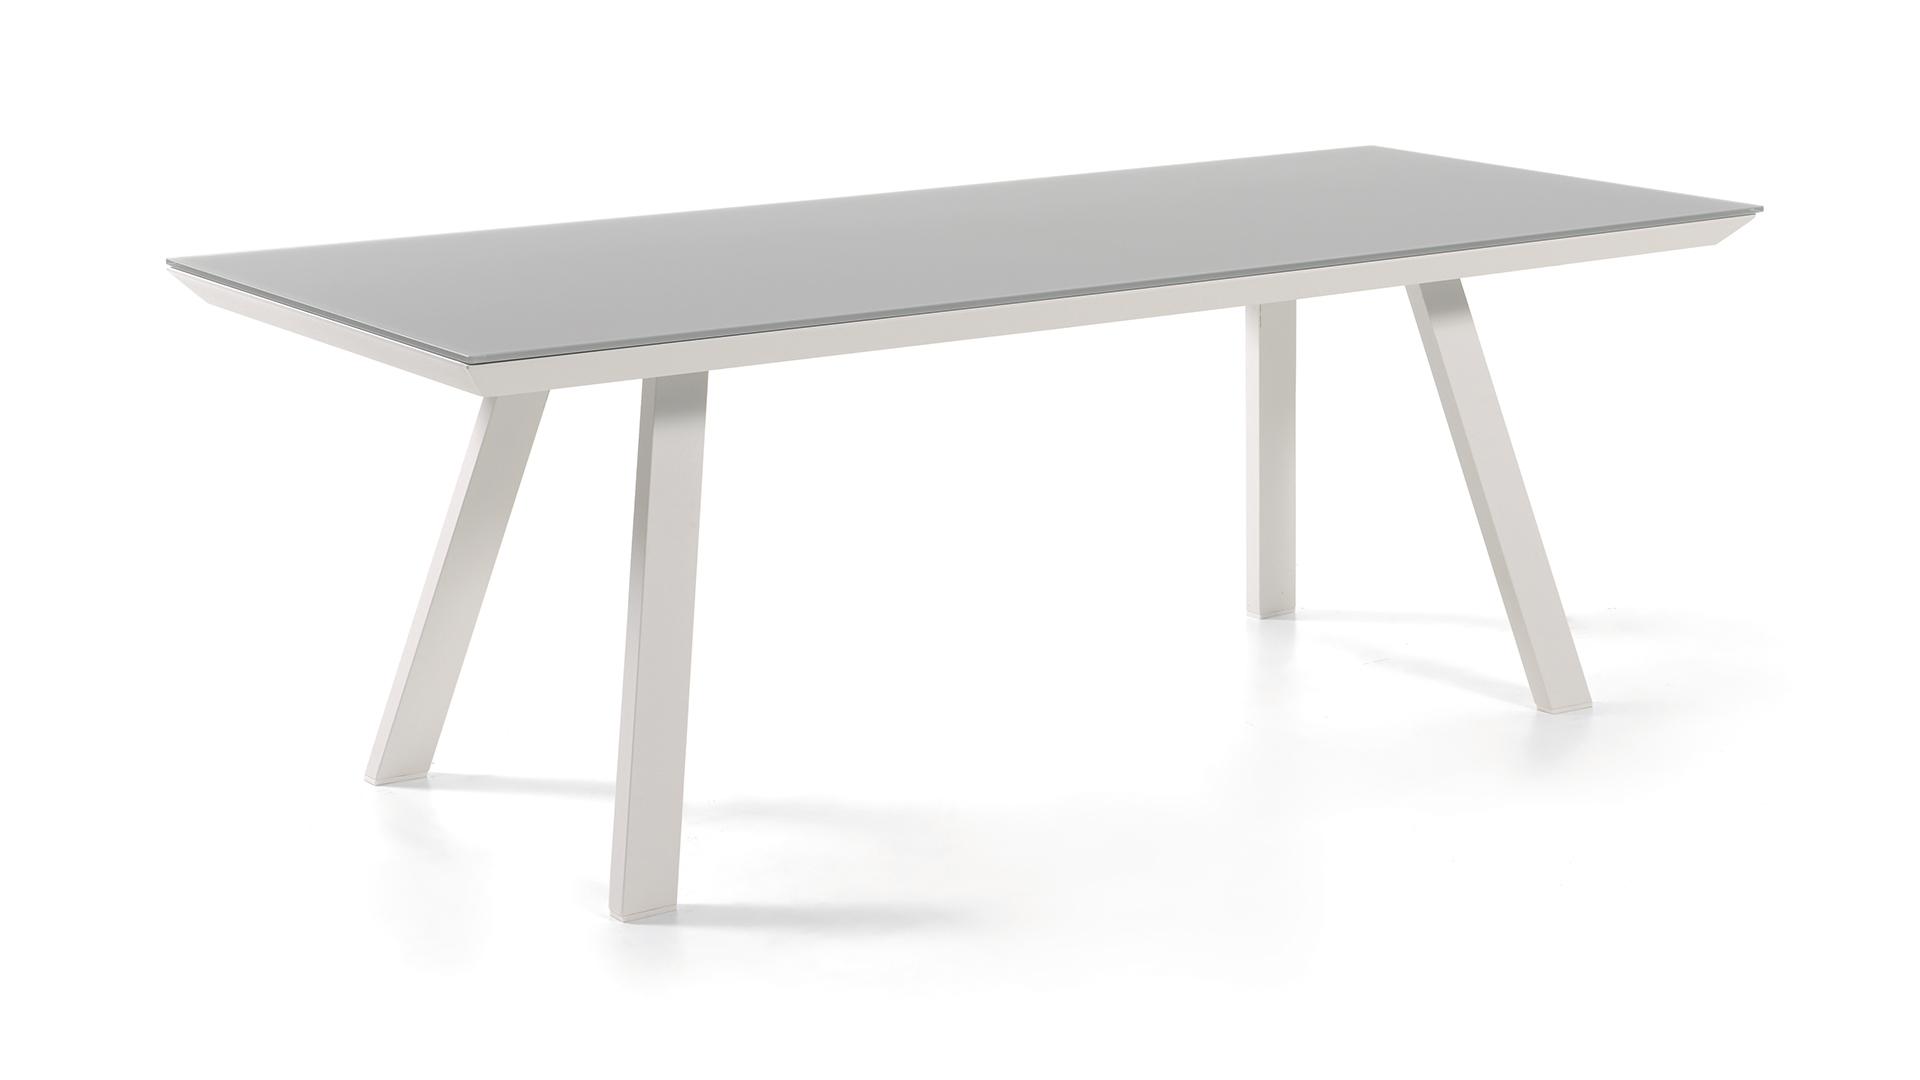 Tuintafel Met Glazen Bovenblad.Alu Tuintafel Versace White Light Grey 220 100cm